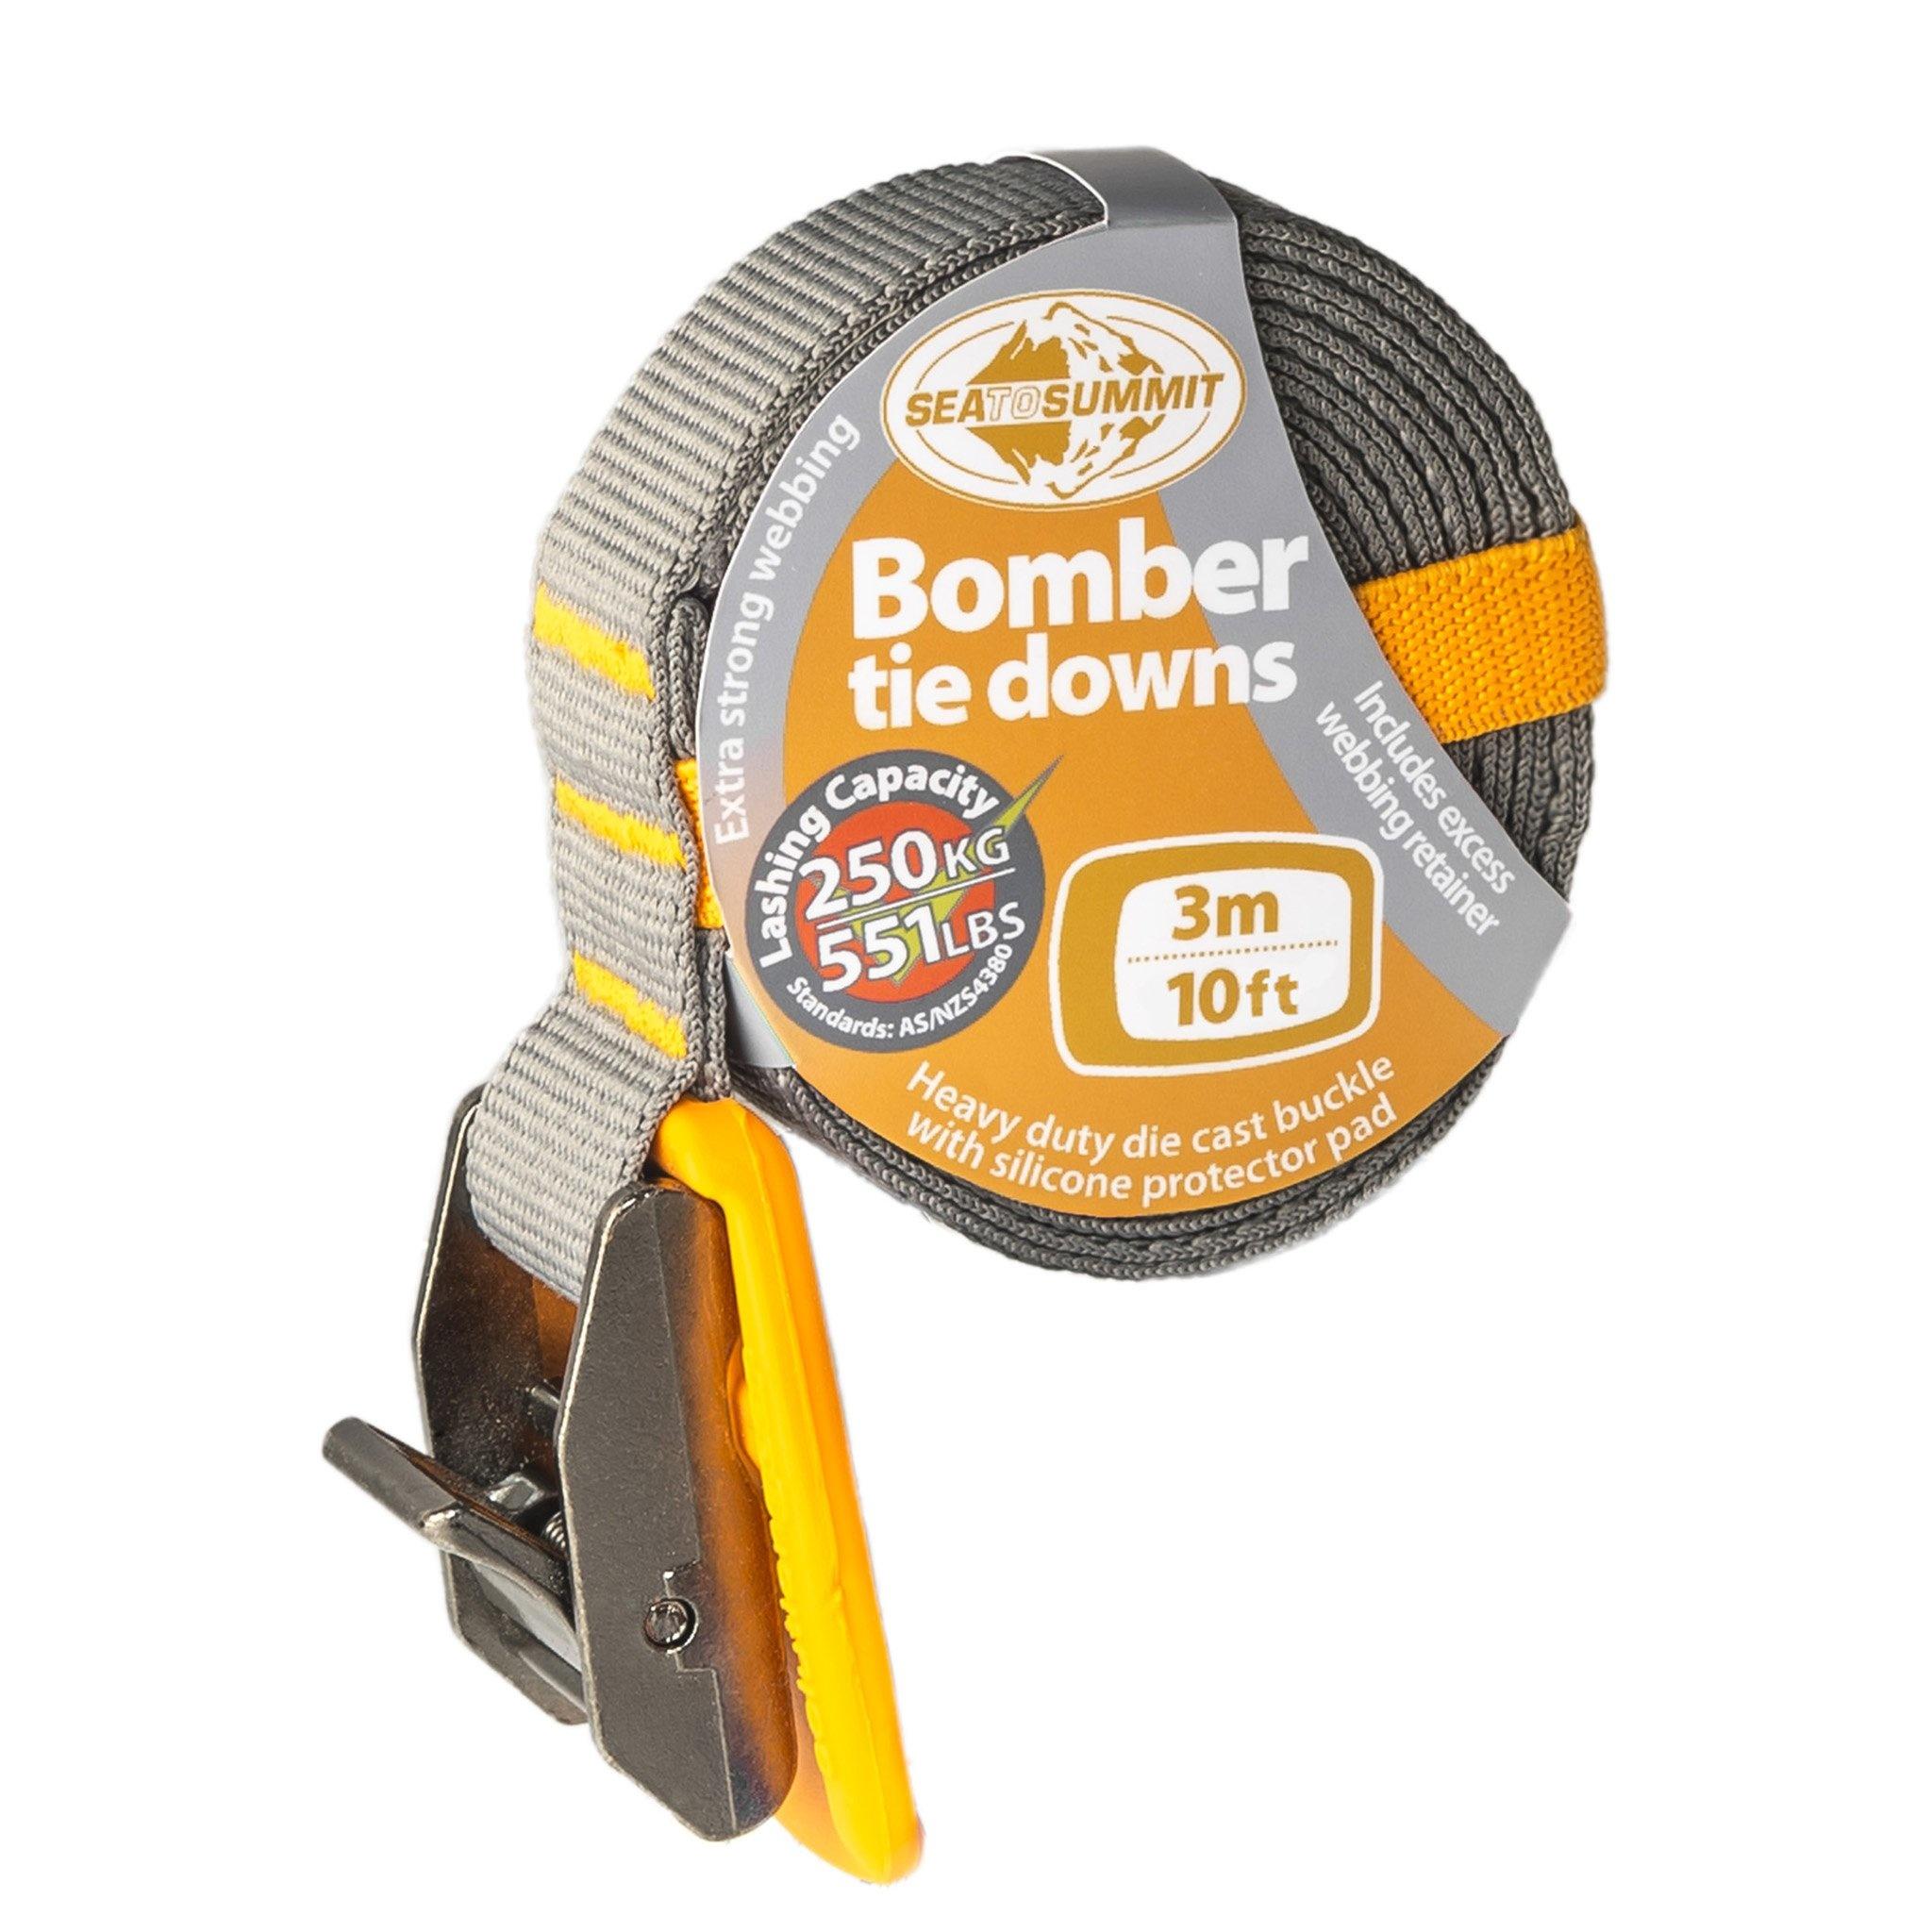 Bomber Tie Down 10ft-1